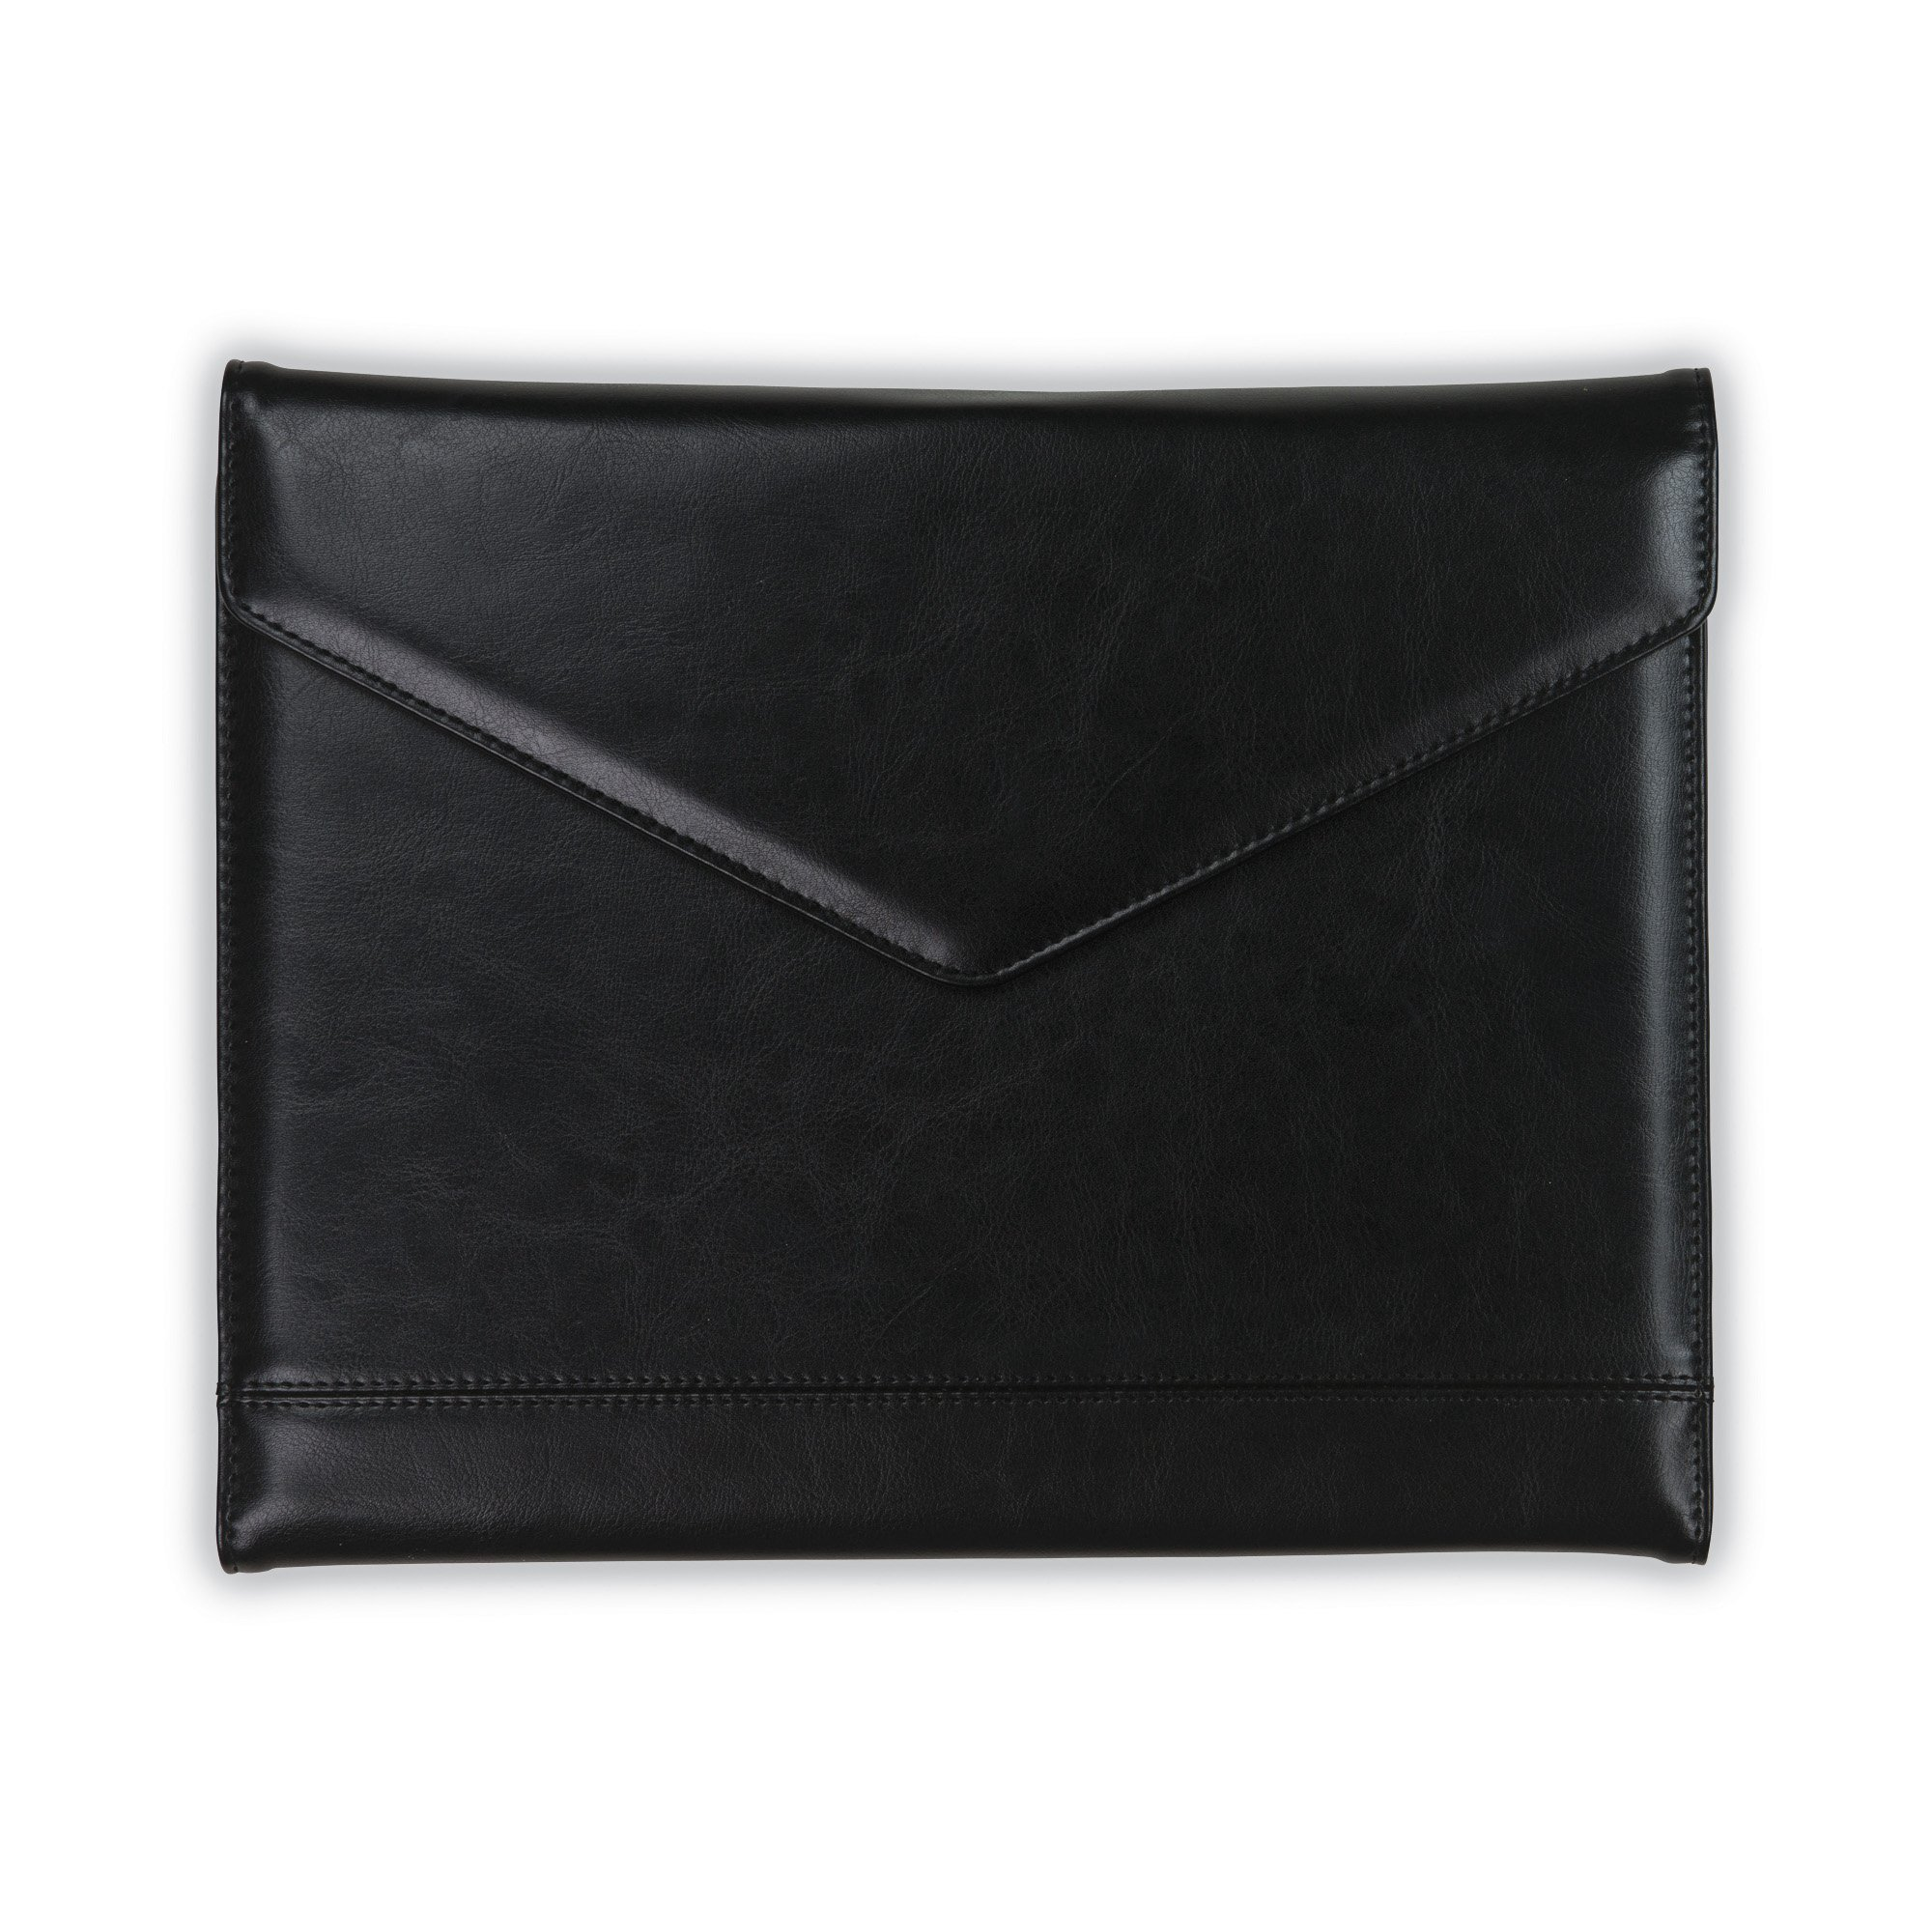 Samsill Envelope Style Trifold Padfolio for Women – Resume Portfolio/Business Portfolio with Magnetic Closure (Black, Letter Size)